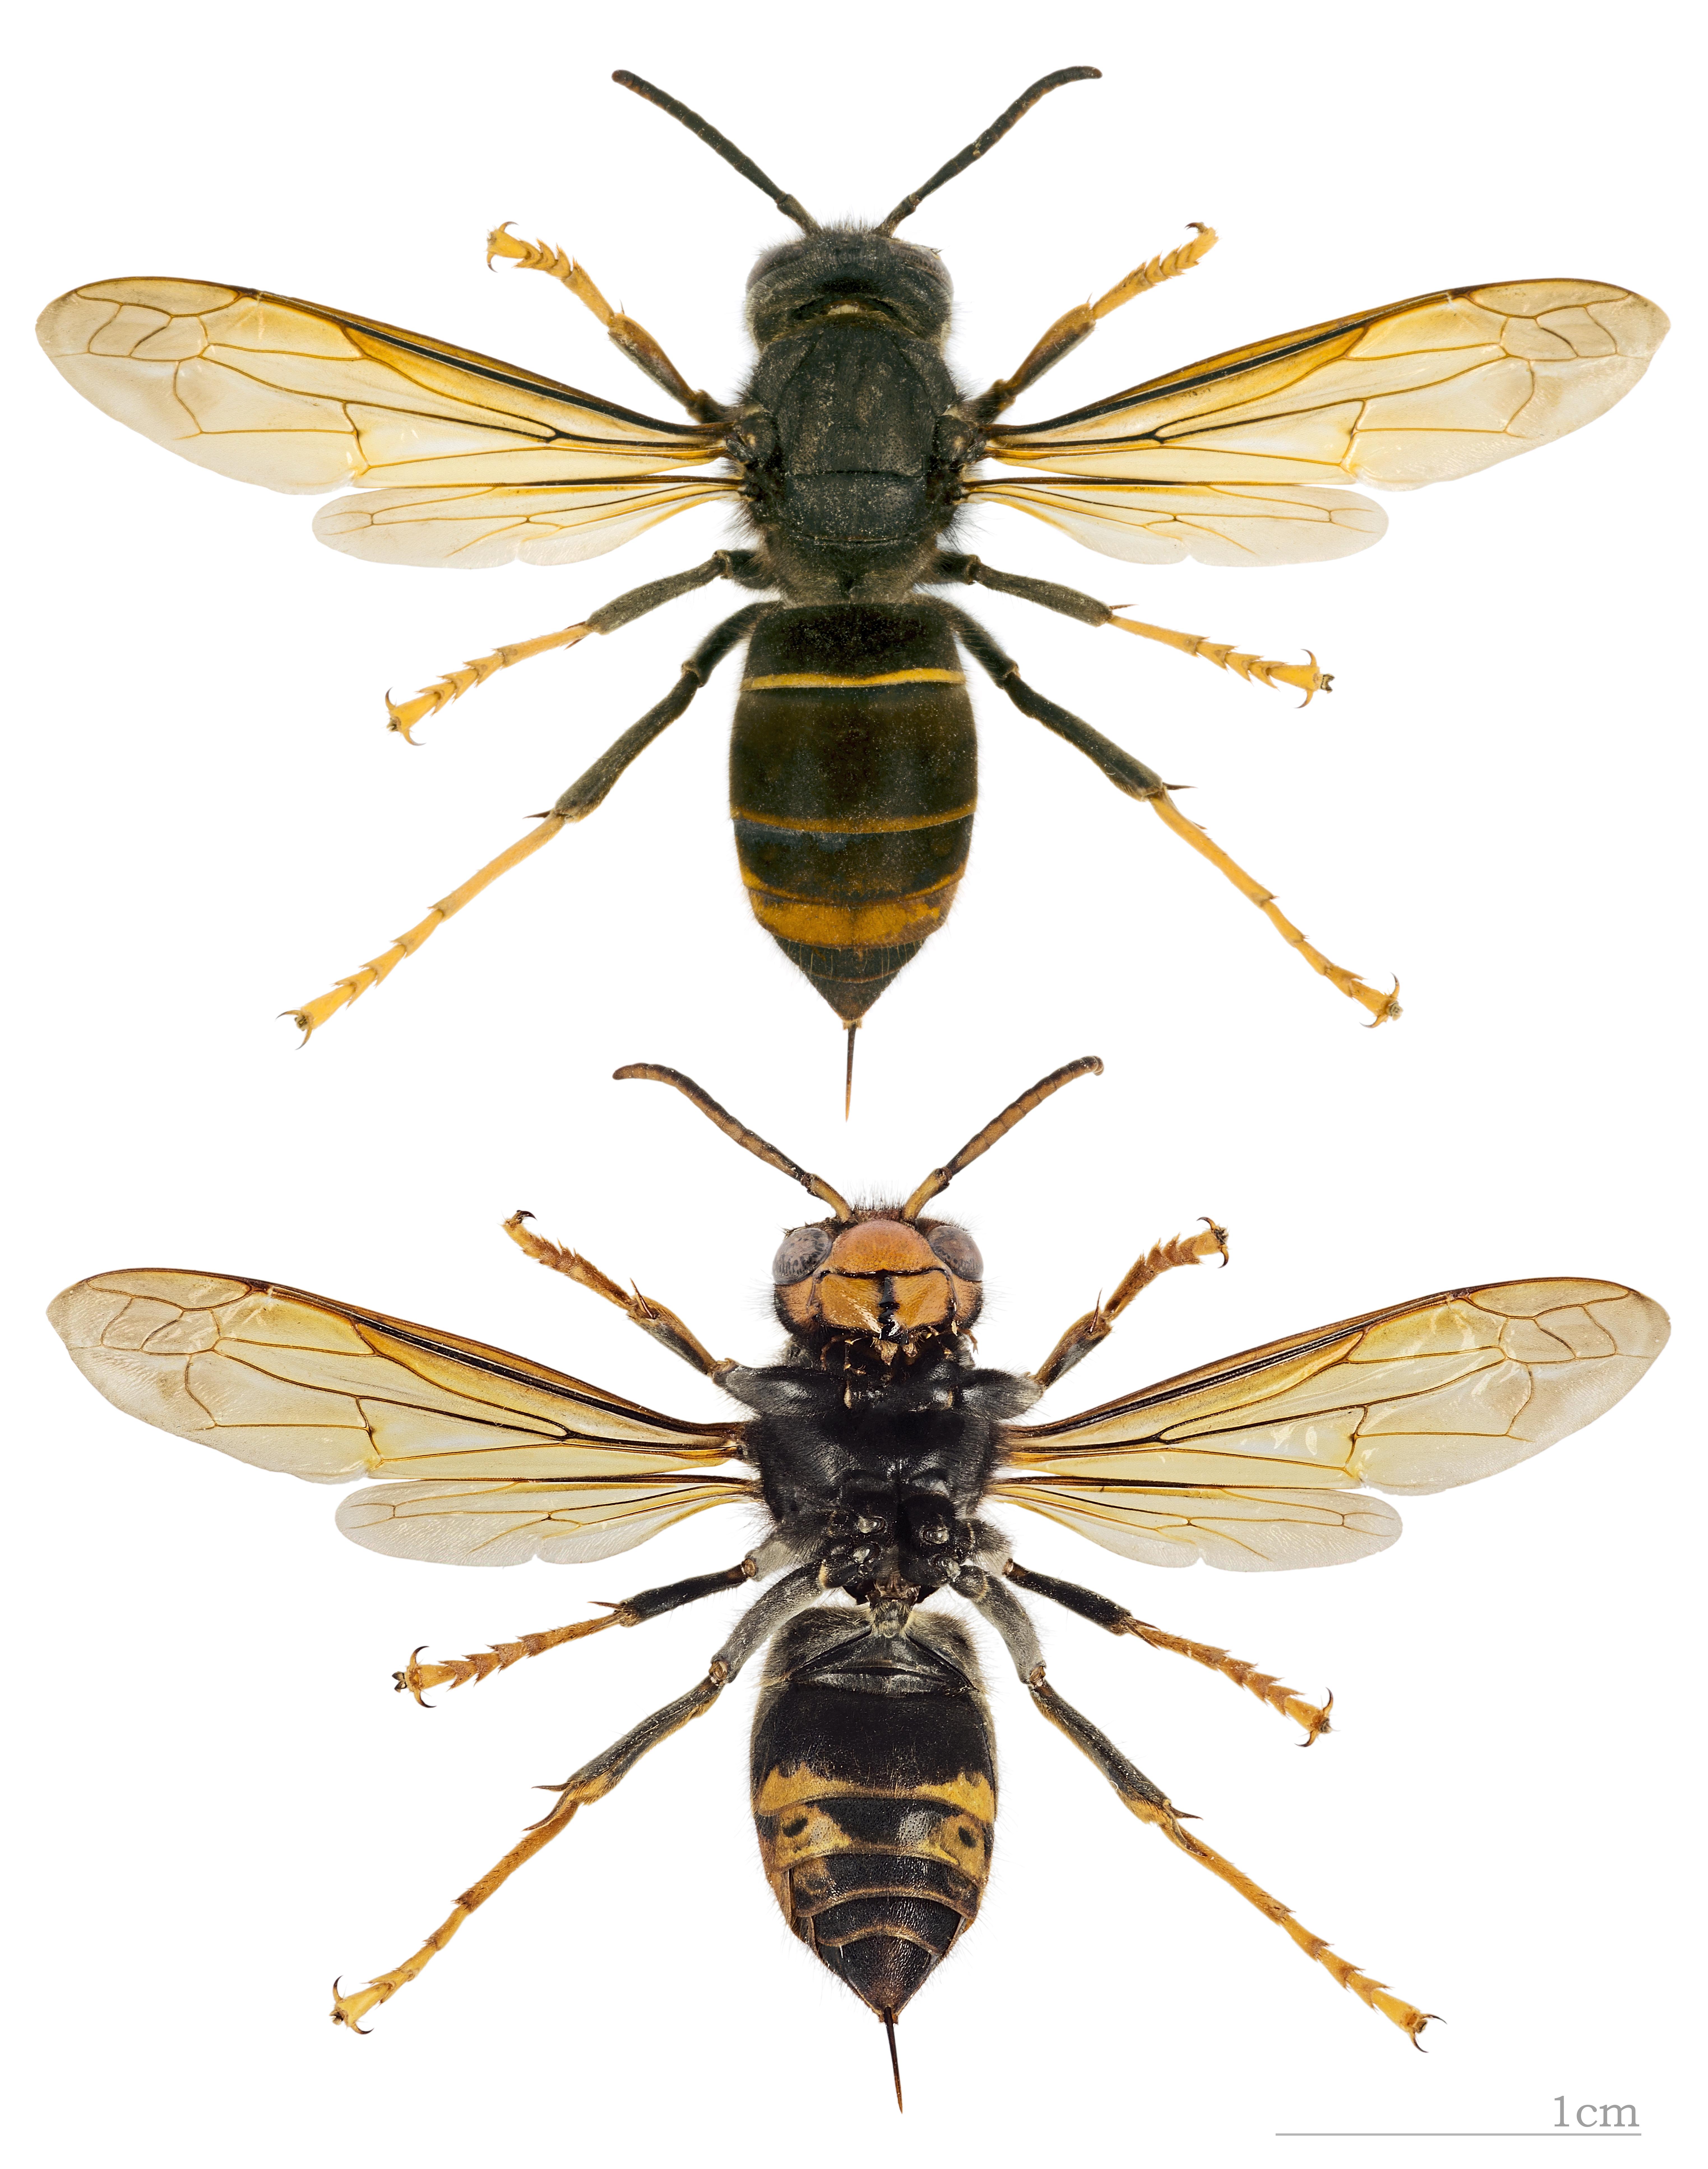 http://upload.wikimedia.org/wikipedia/commons/7/76/Vespa_velutina_nigrithorax_MHNT.jpg